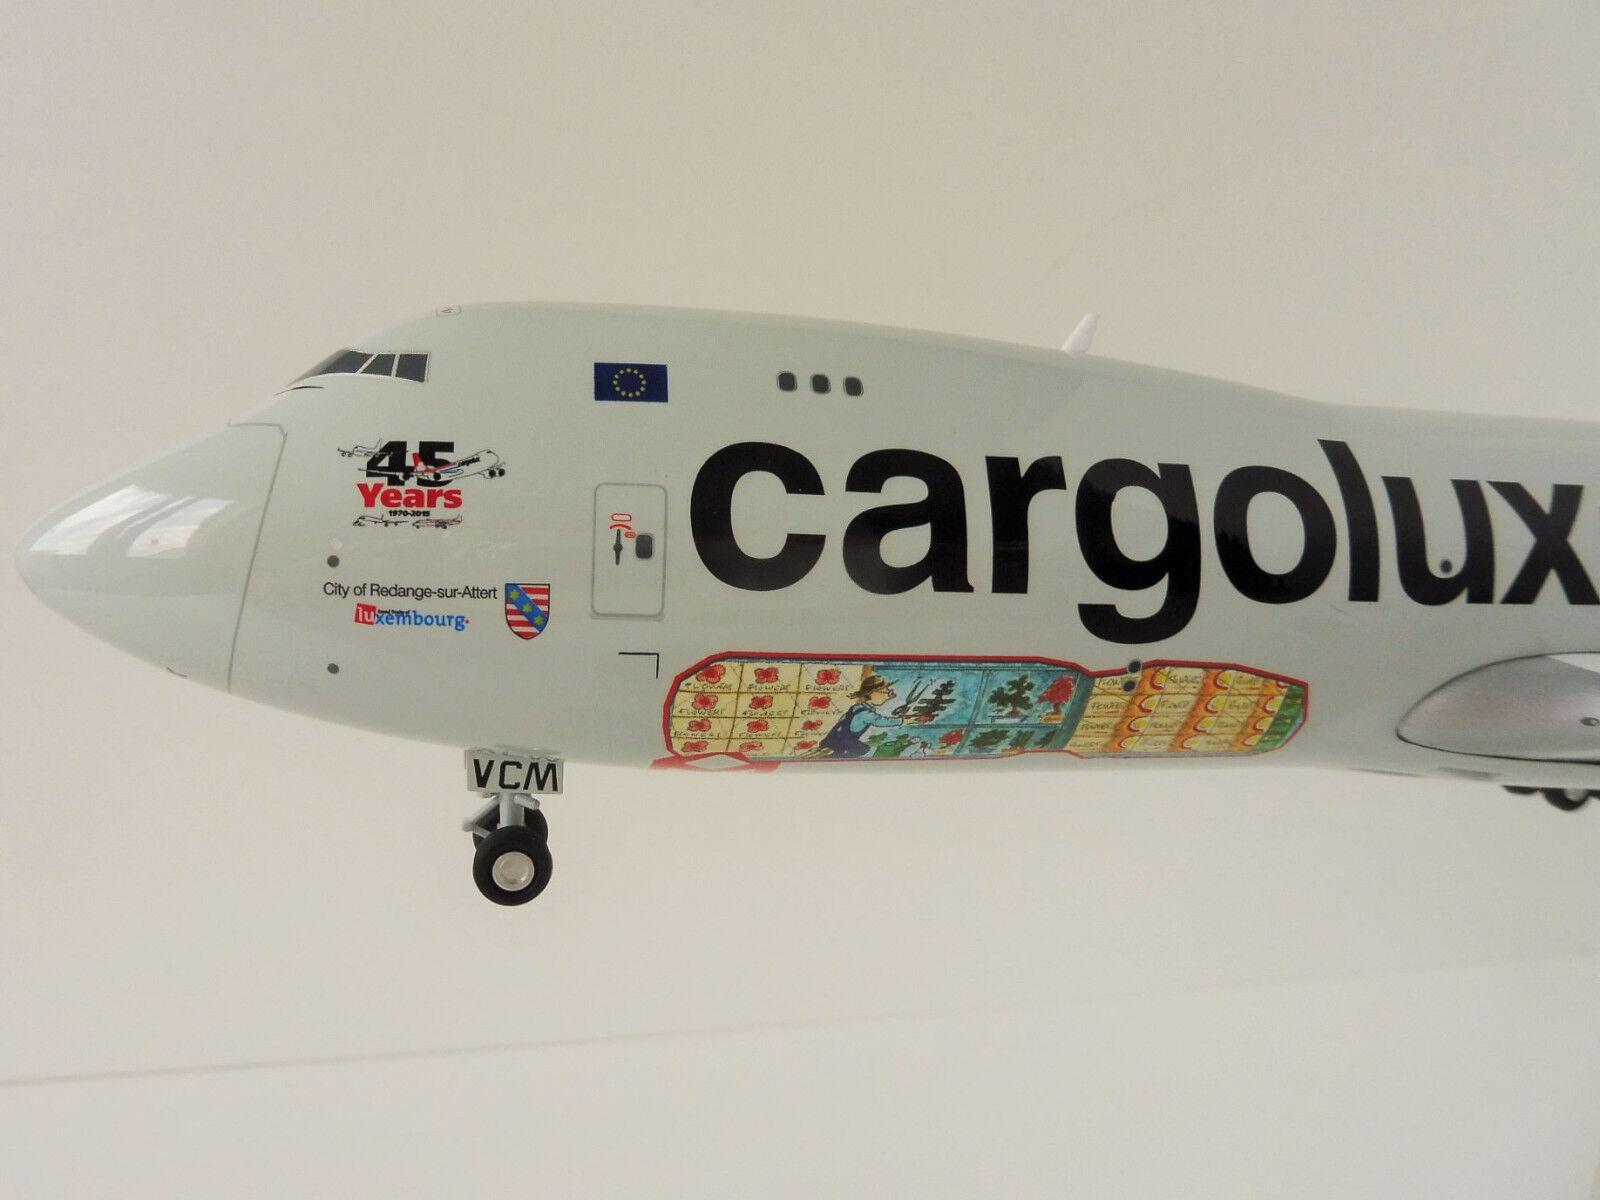 Boeing 747-8F Cargolux 1/200 Herpa 558228 45th Anniversario 747 747-8